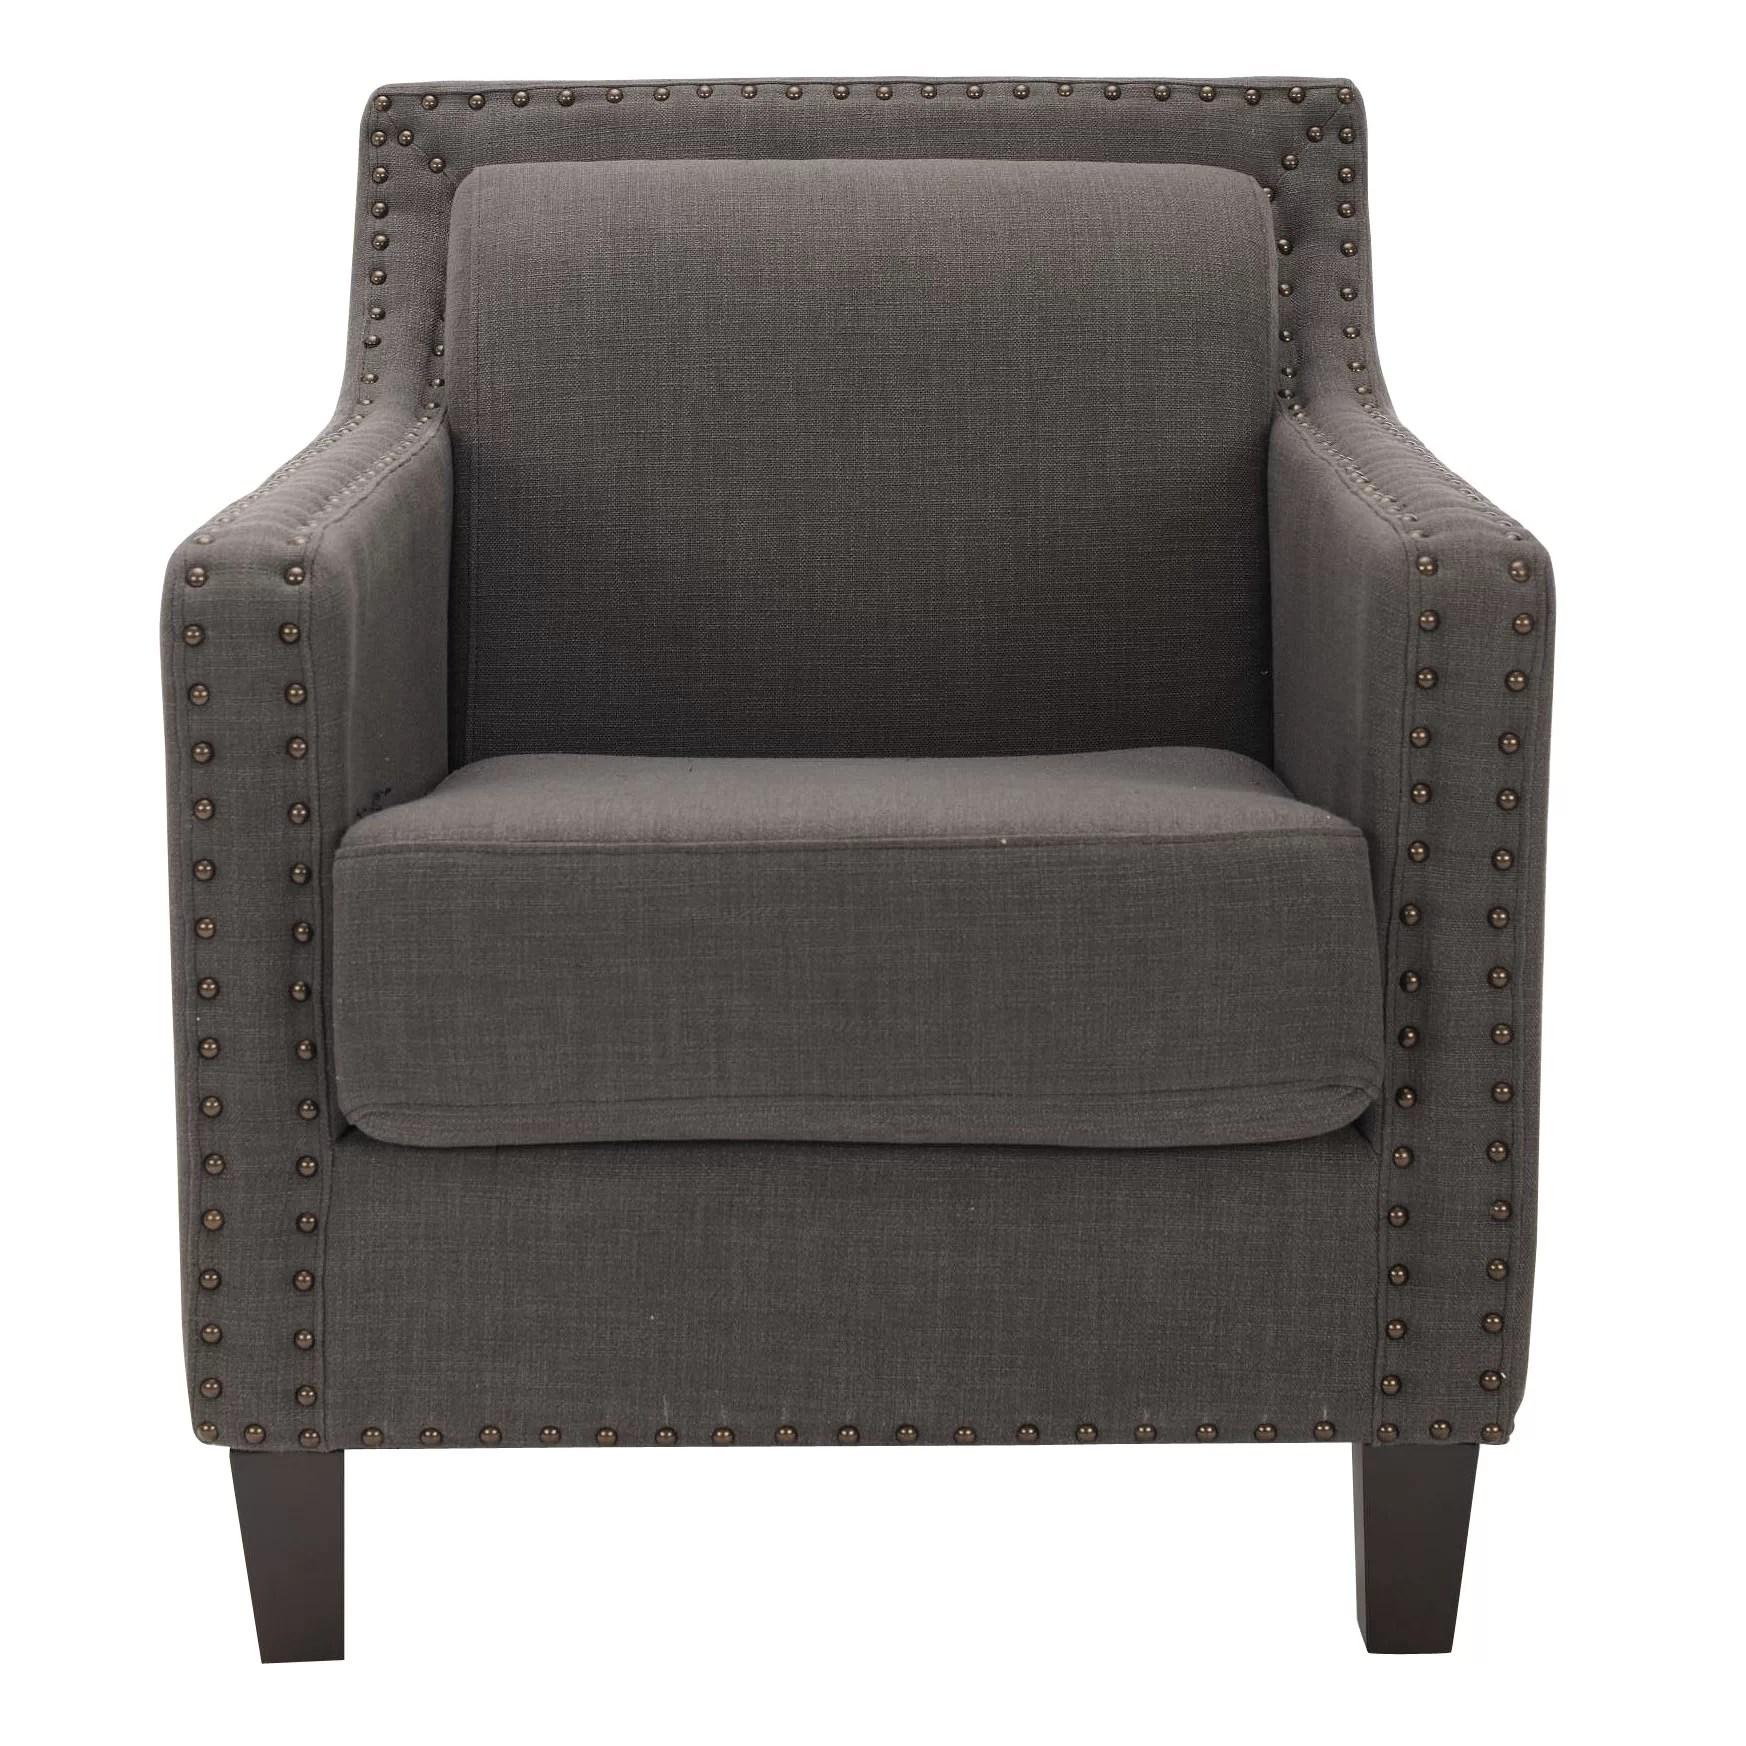 bedroom chair wayfair swivel dubai safavieh lucy arm and reviews